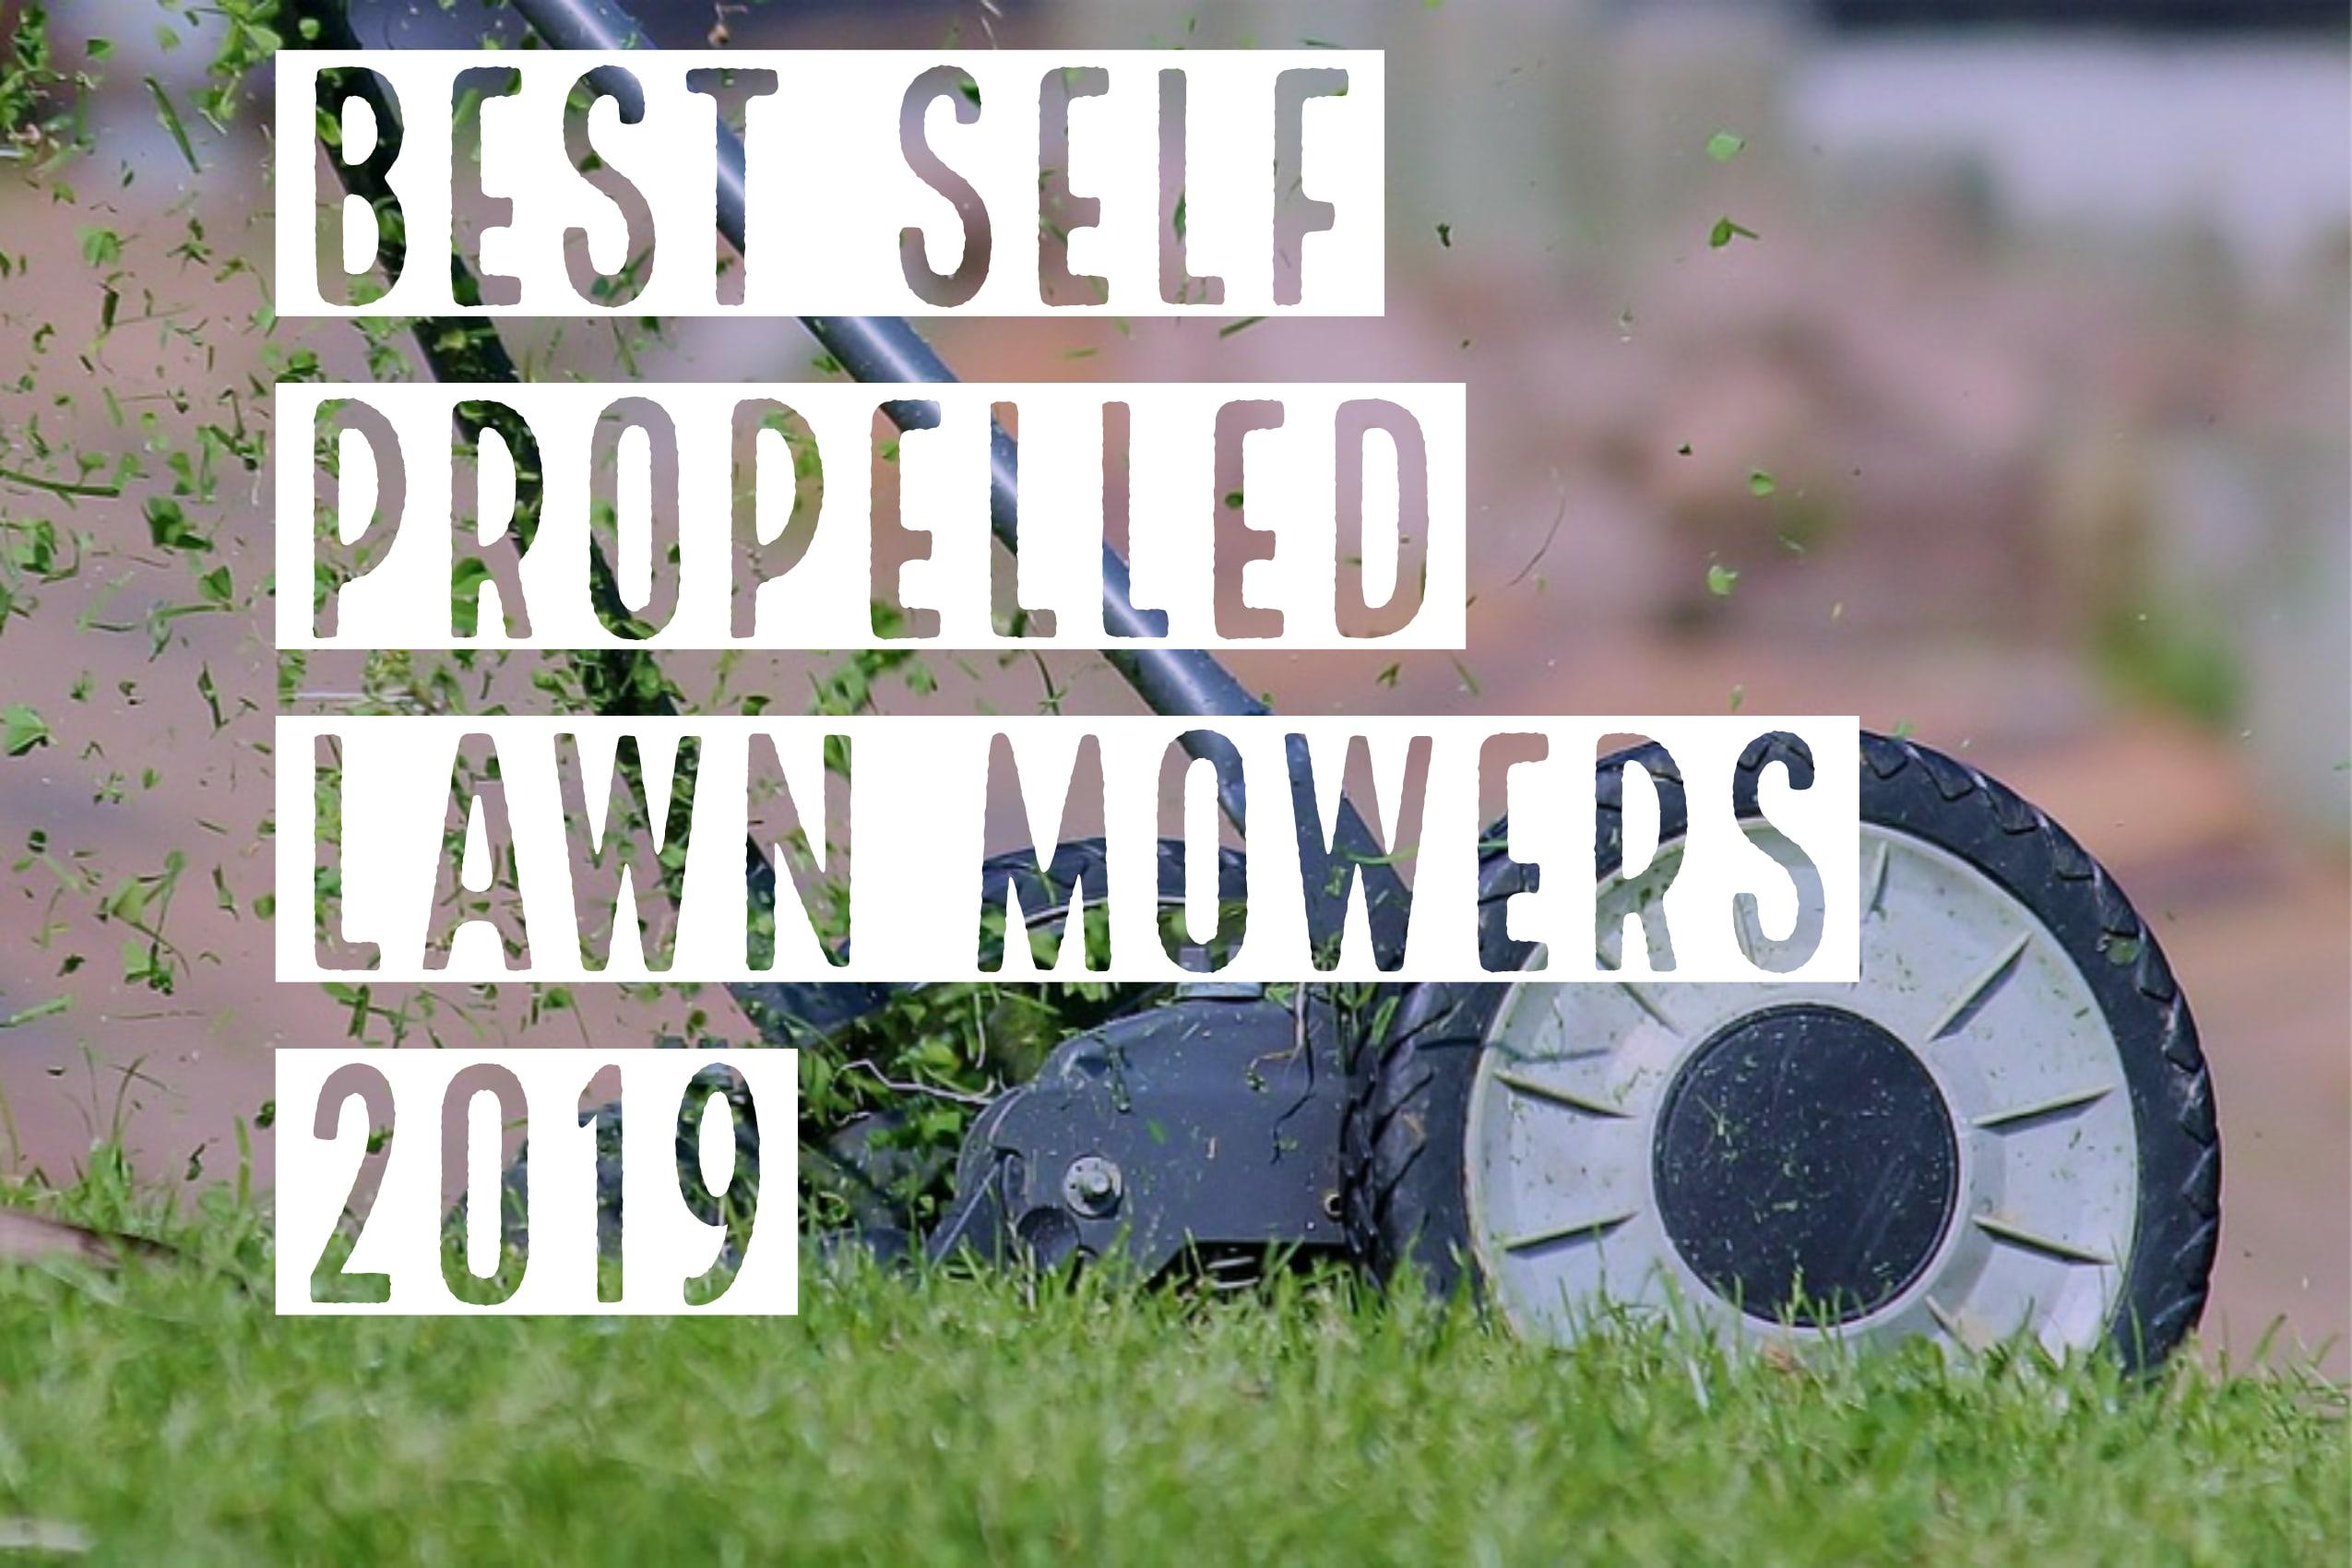 Best Self Propelled Lawn Mower 2020 Reviews, Ratings & Comparisons